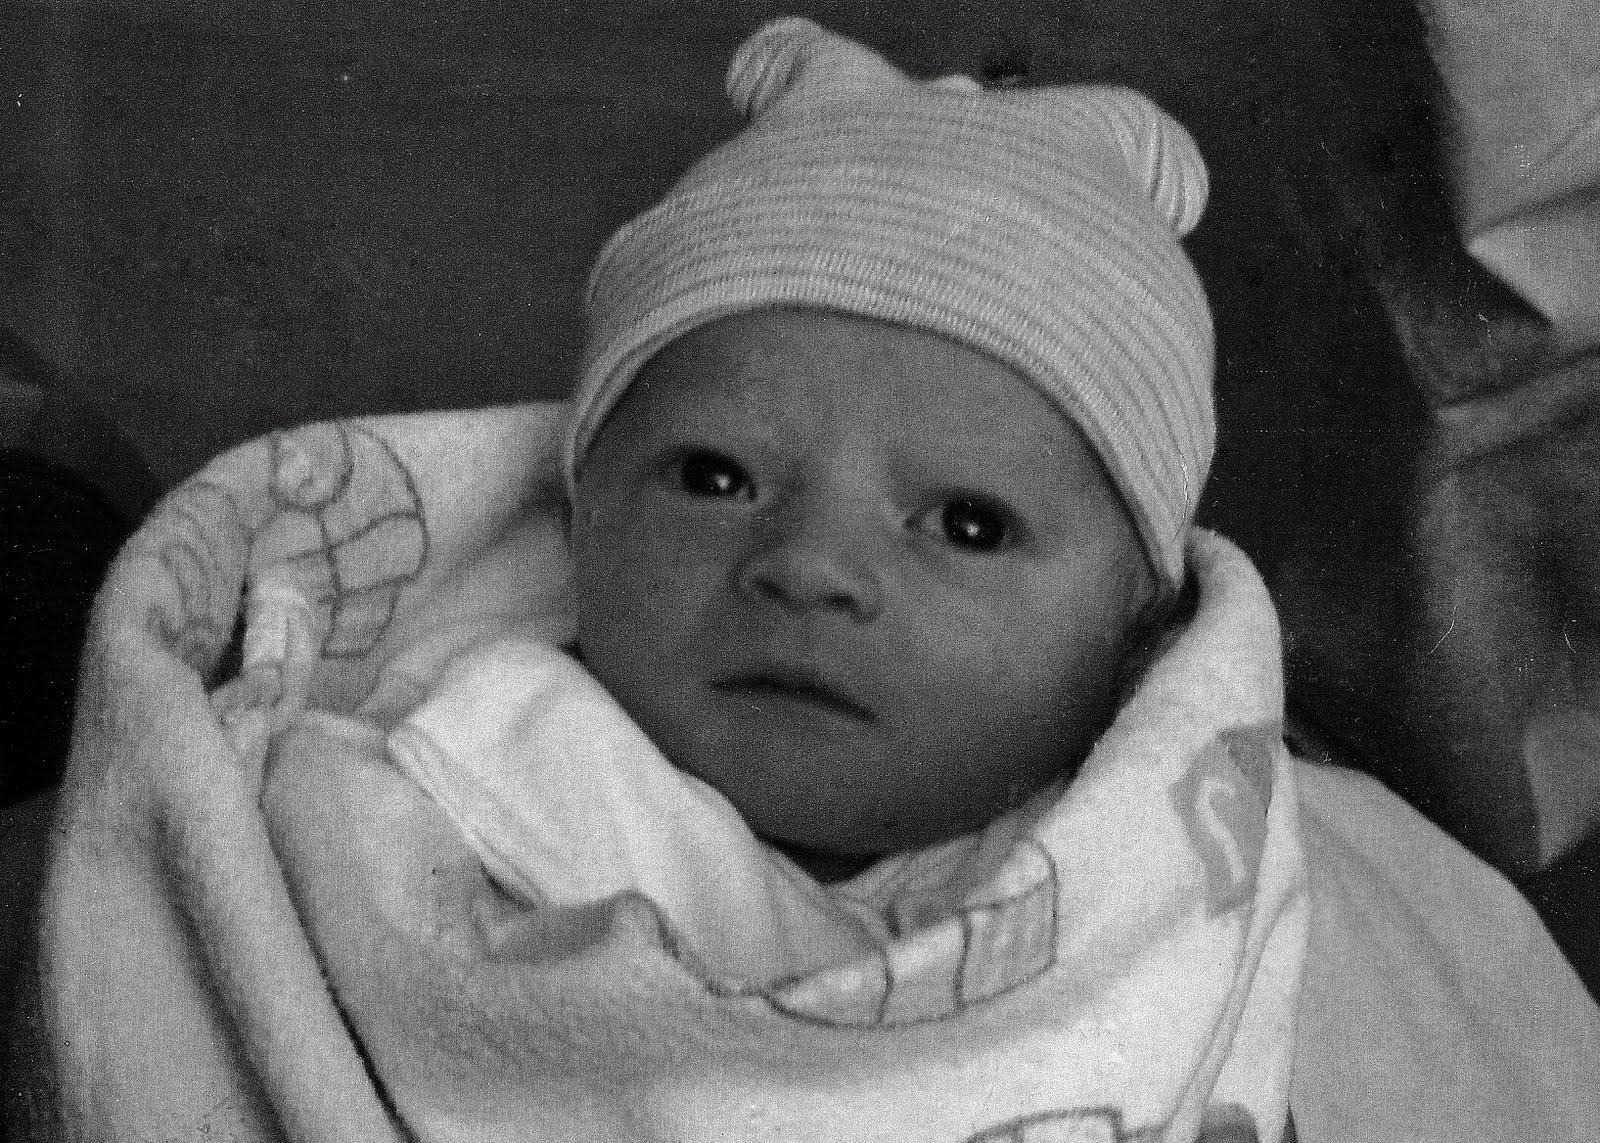 http://4.bp.blogspot.com/_A2GB0E_ONKE/TJmLRoCe9qI/AAAAAAAACvM/ehiwtL_o57A/s1600/tyler+baby+copy.jpg